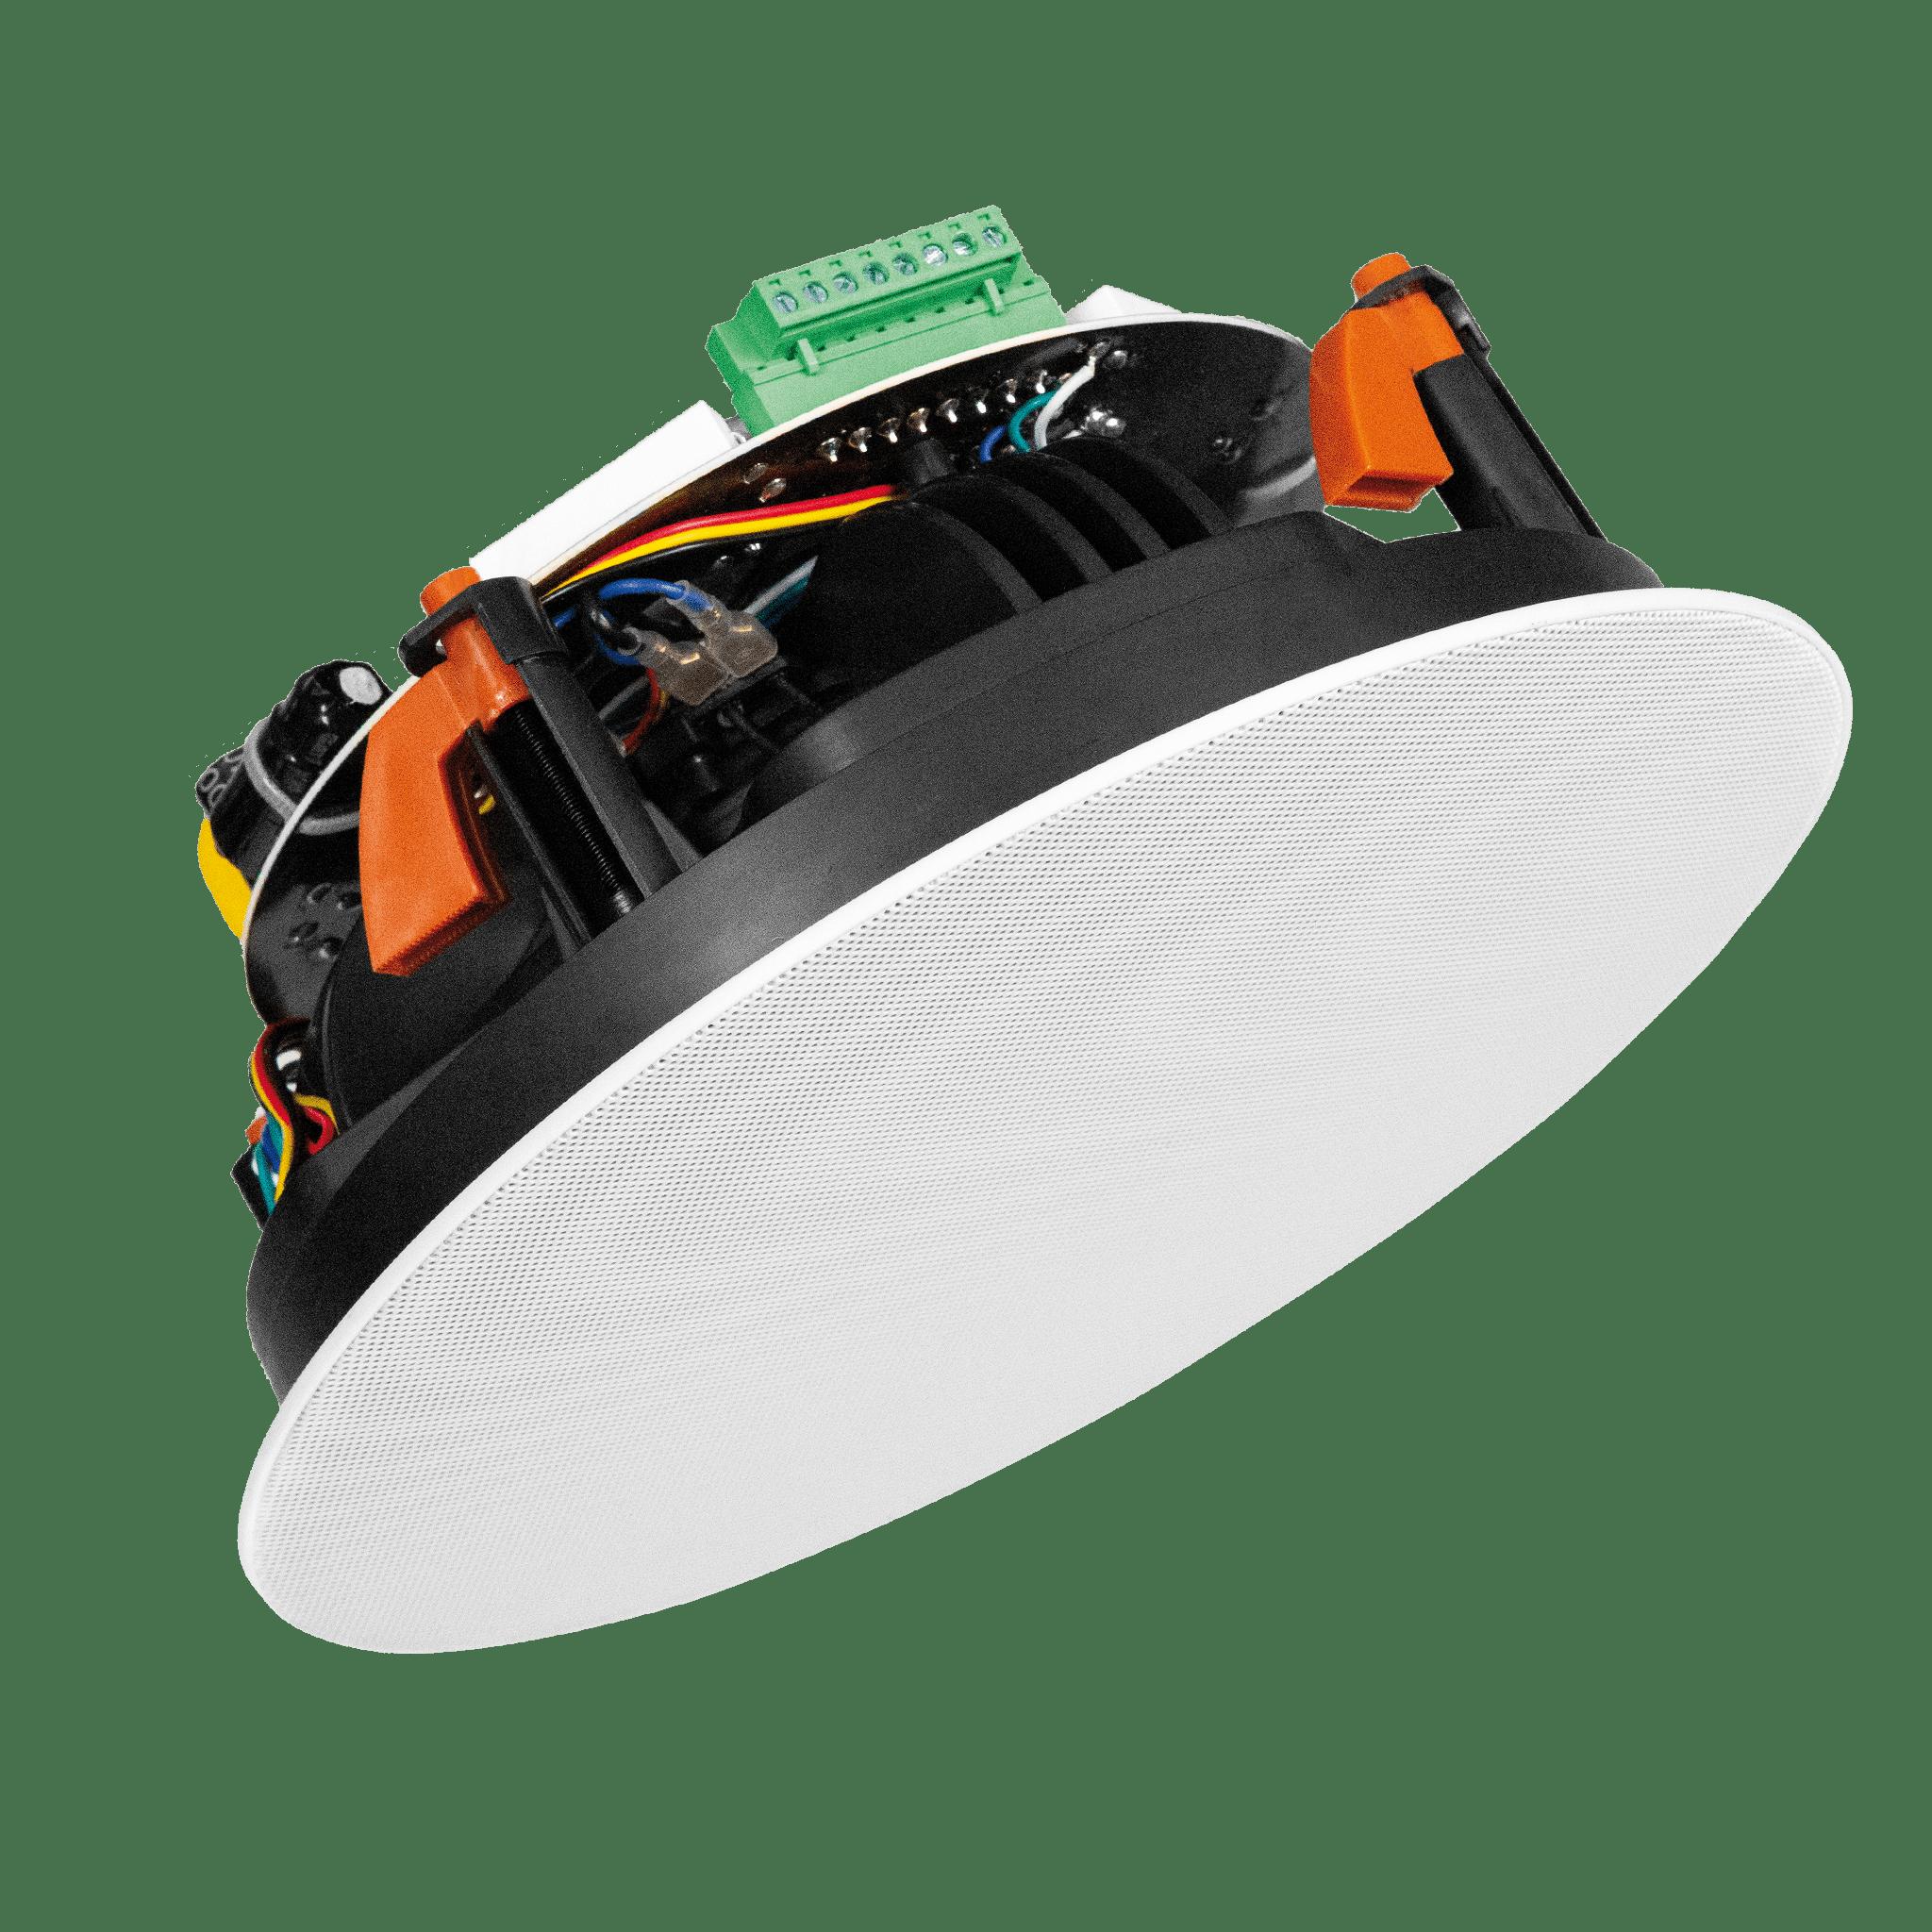 "CELO8S - High-end 8"" ceiling subwoofer"